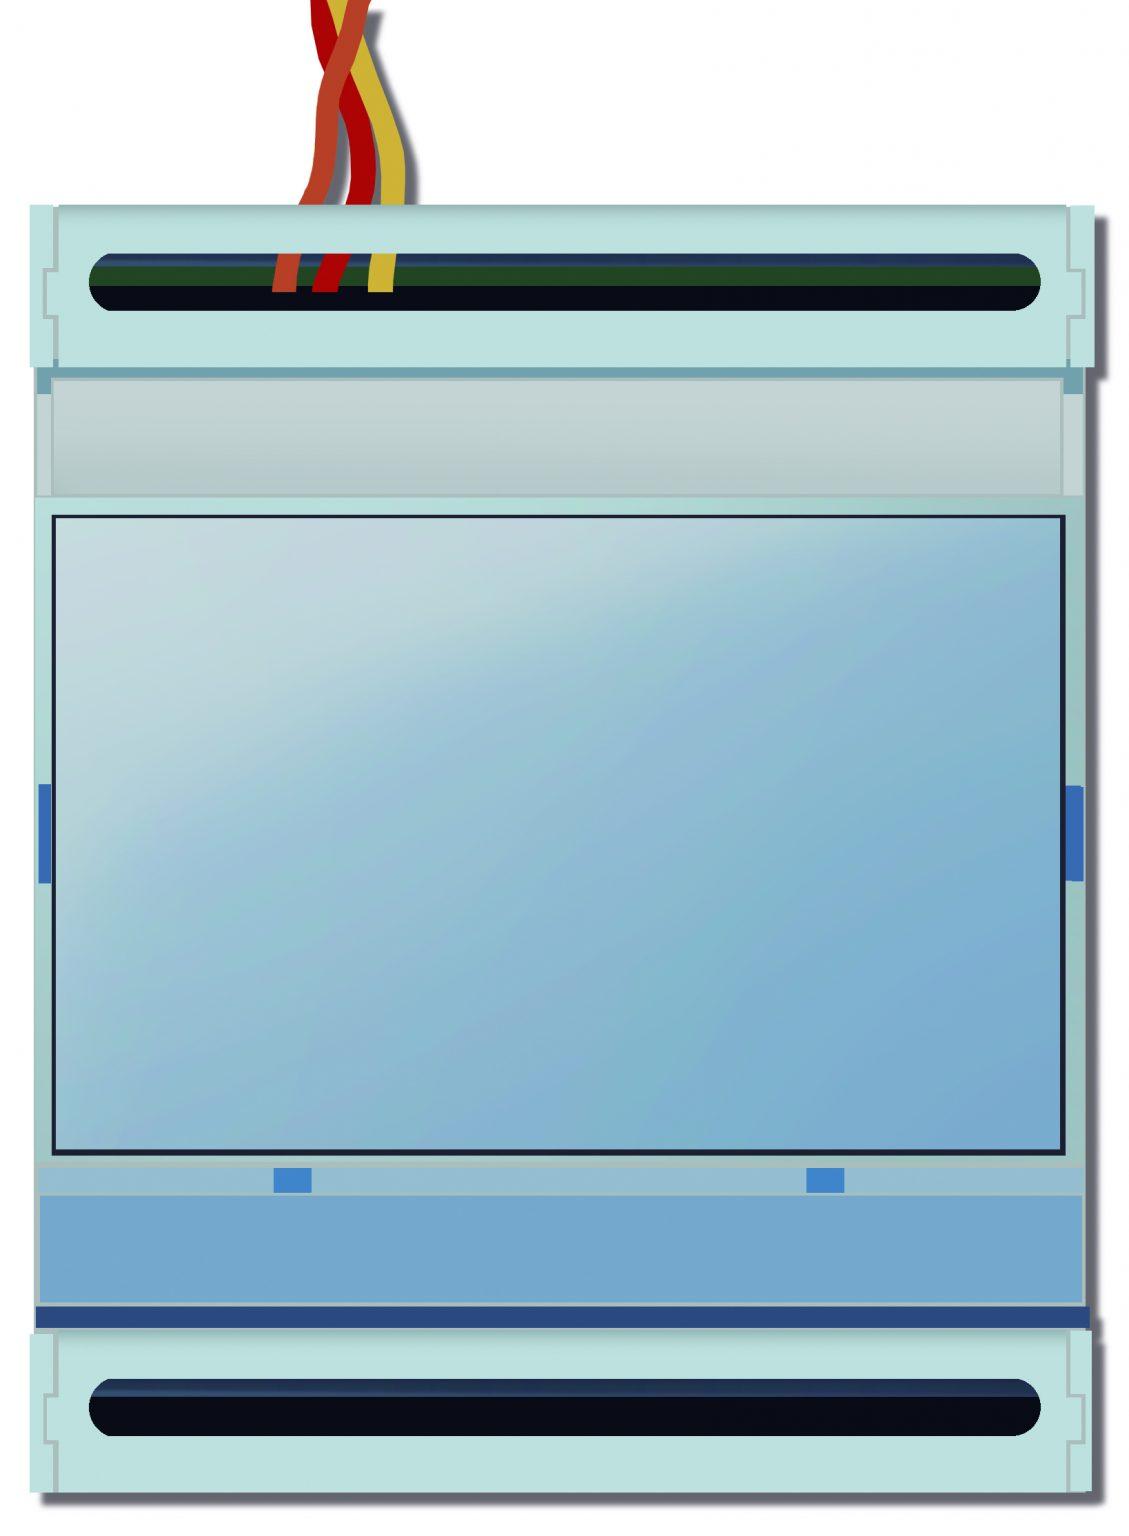 PCB for server room application, control of 3 PACi units, redundancy, backup, etc.